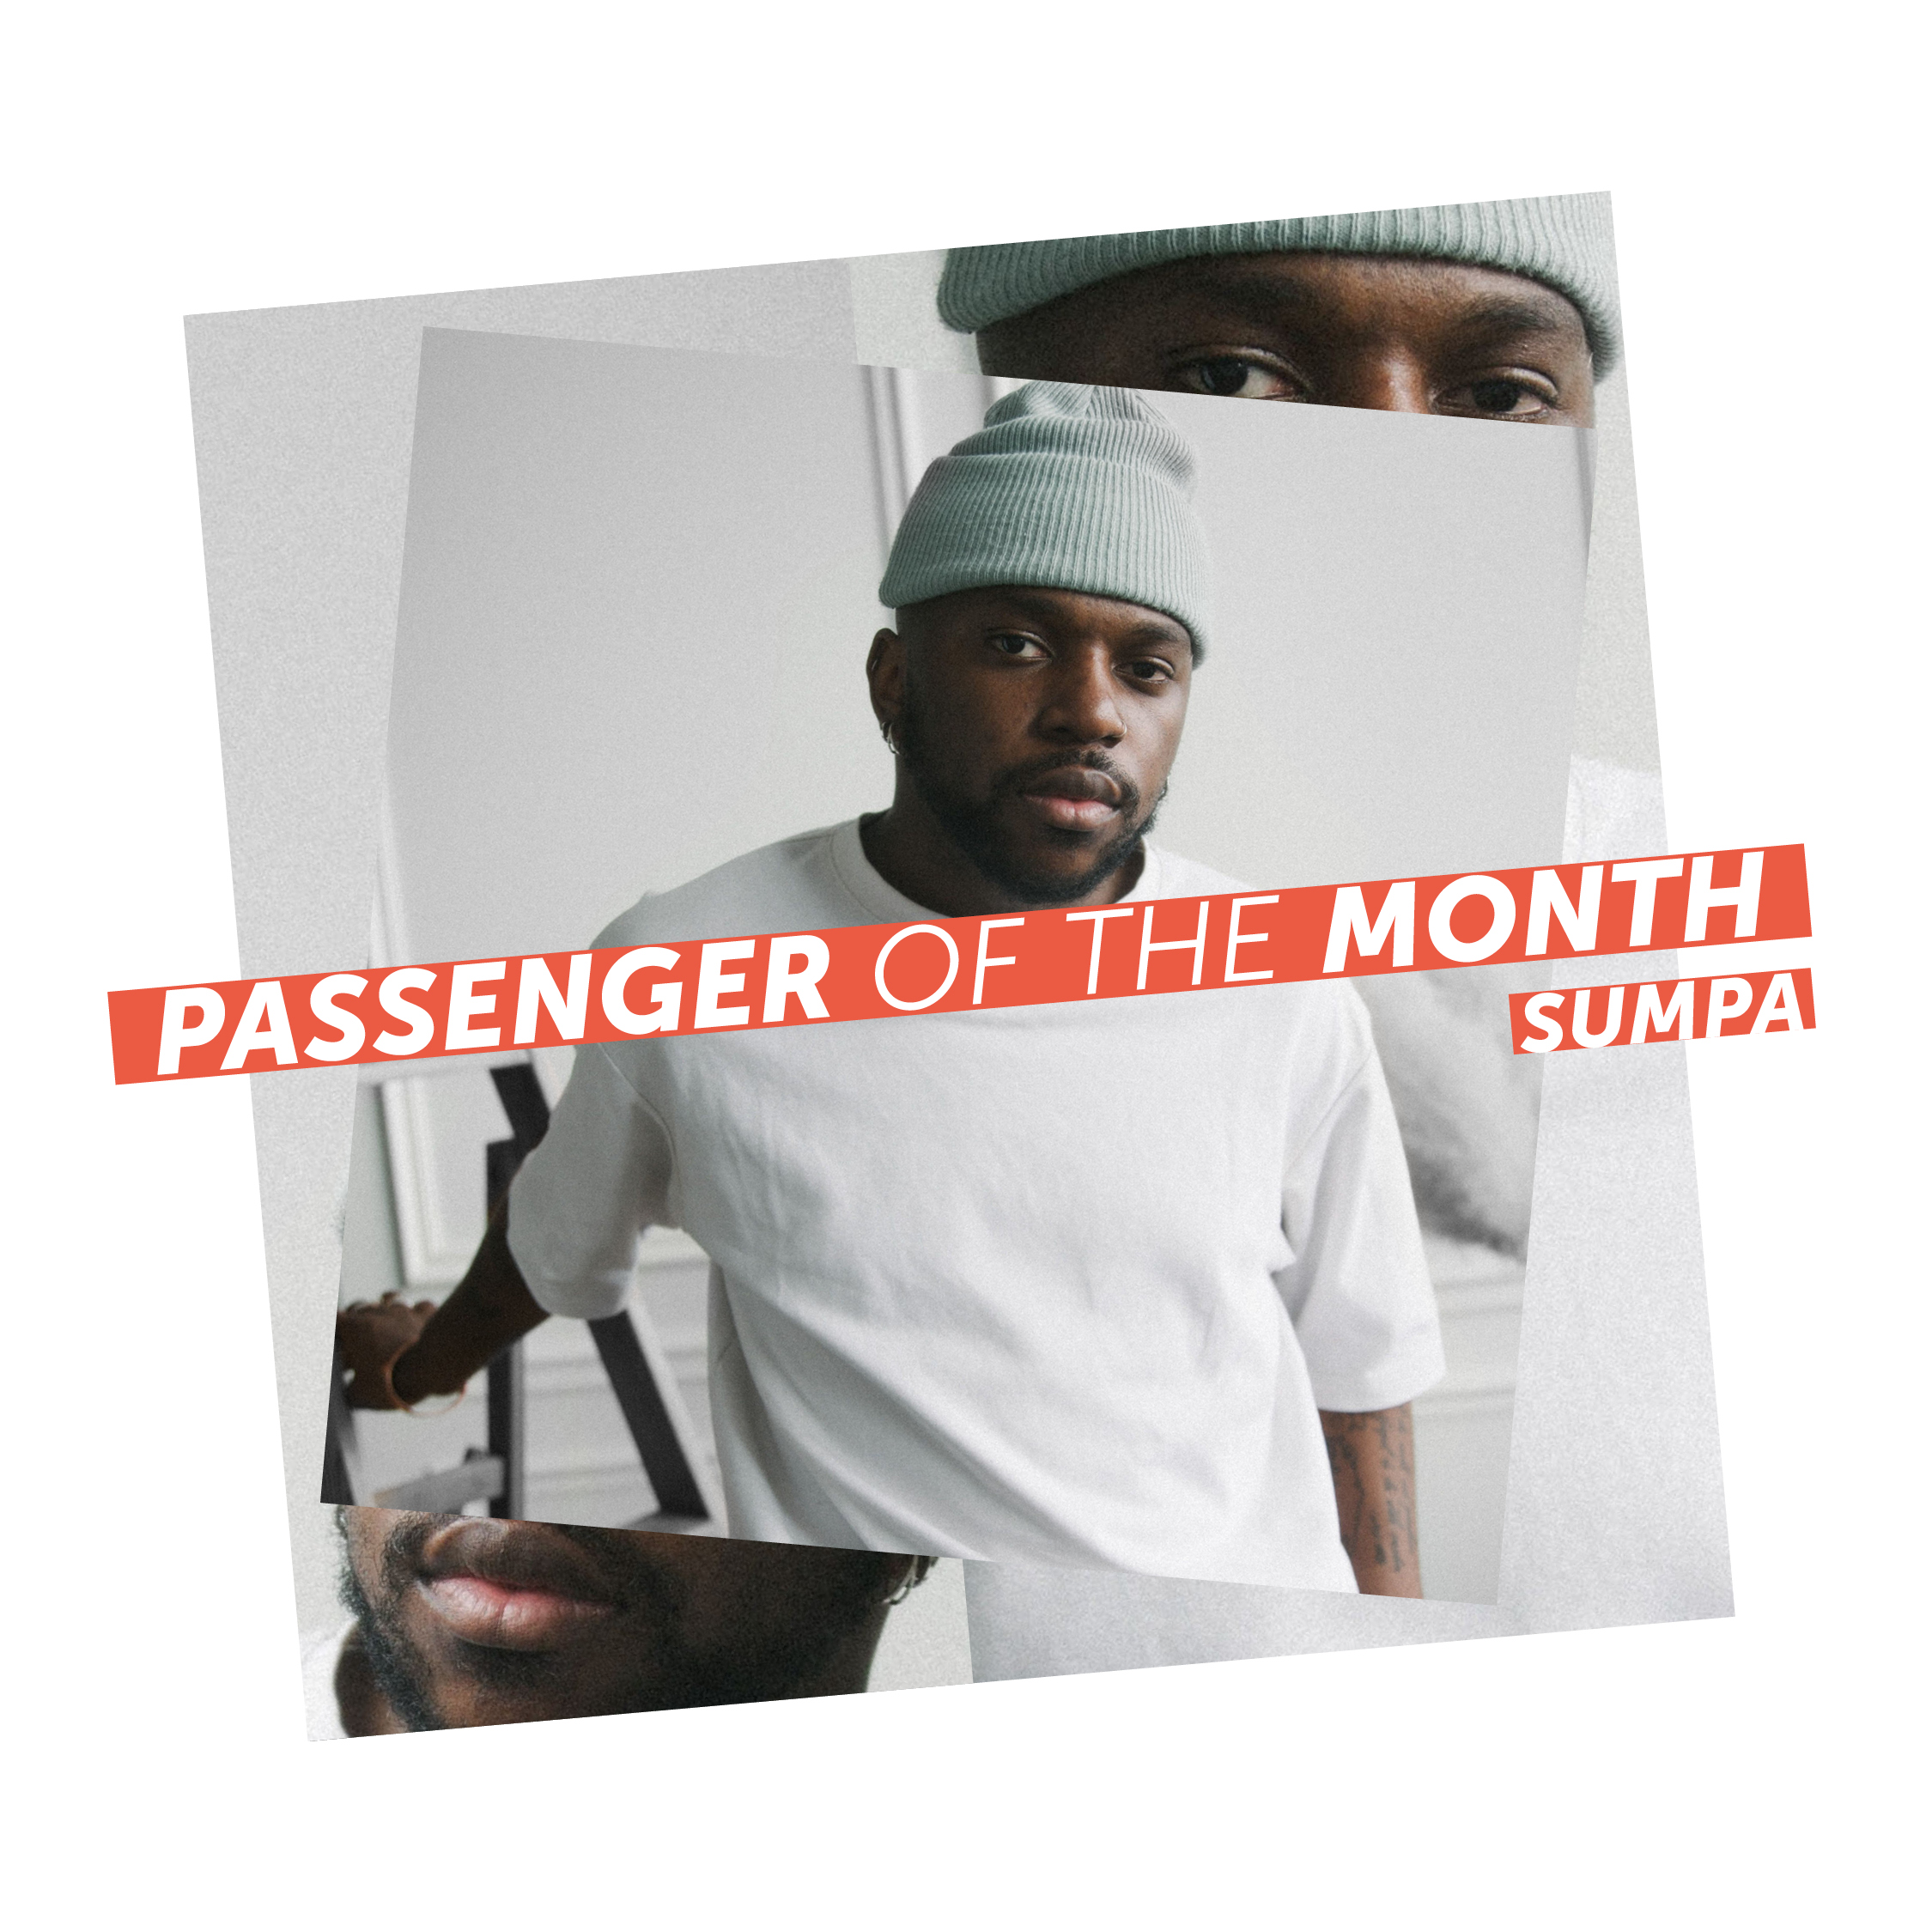 Passenger of the Month Sumpa